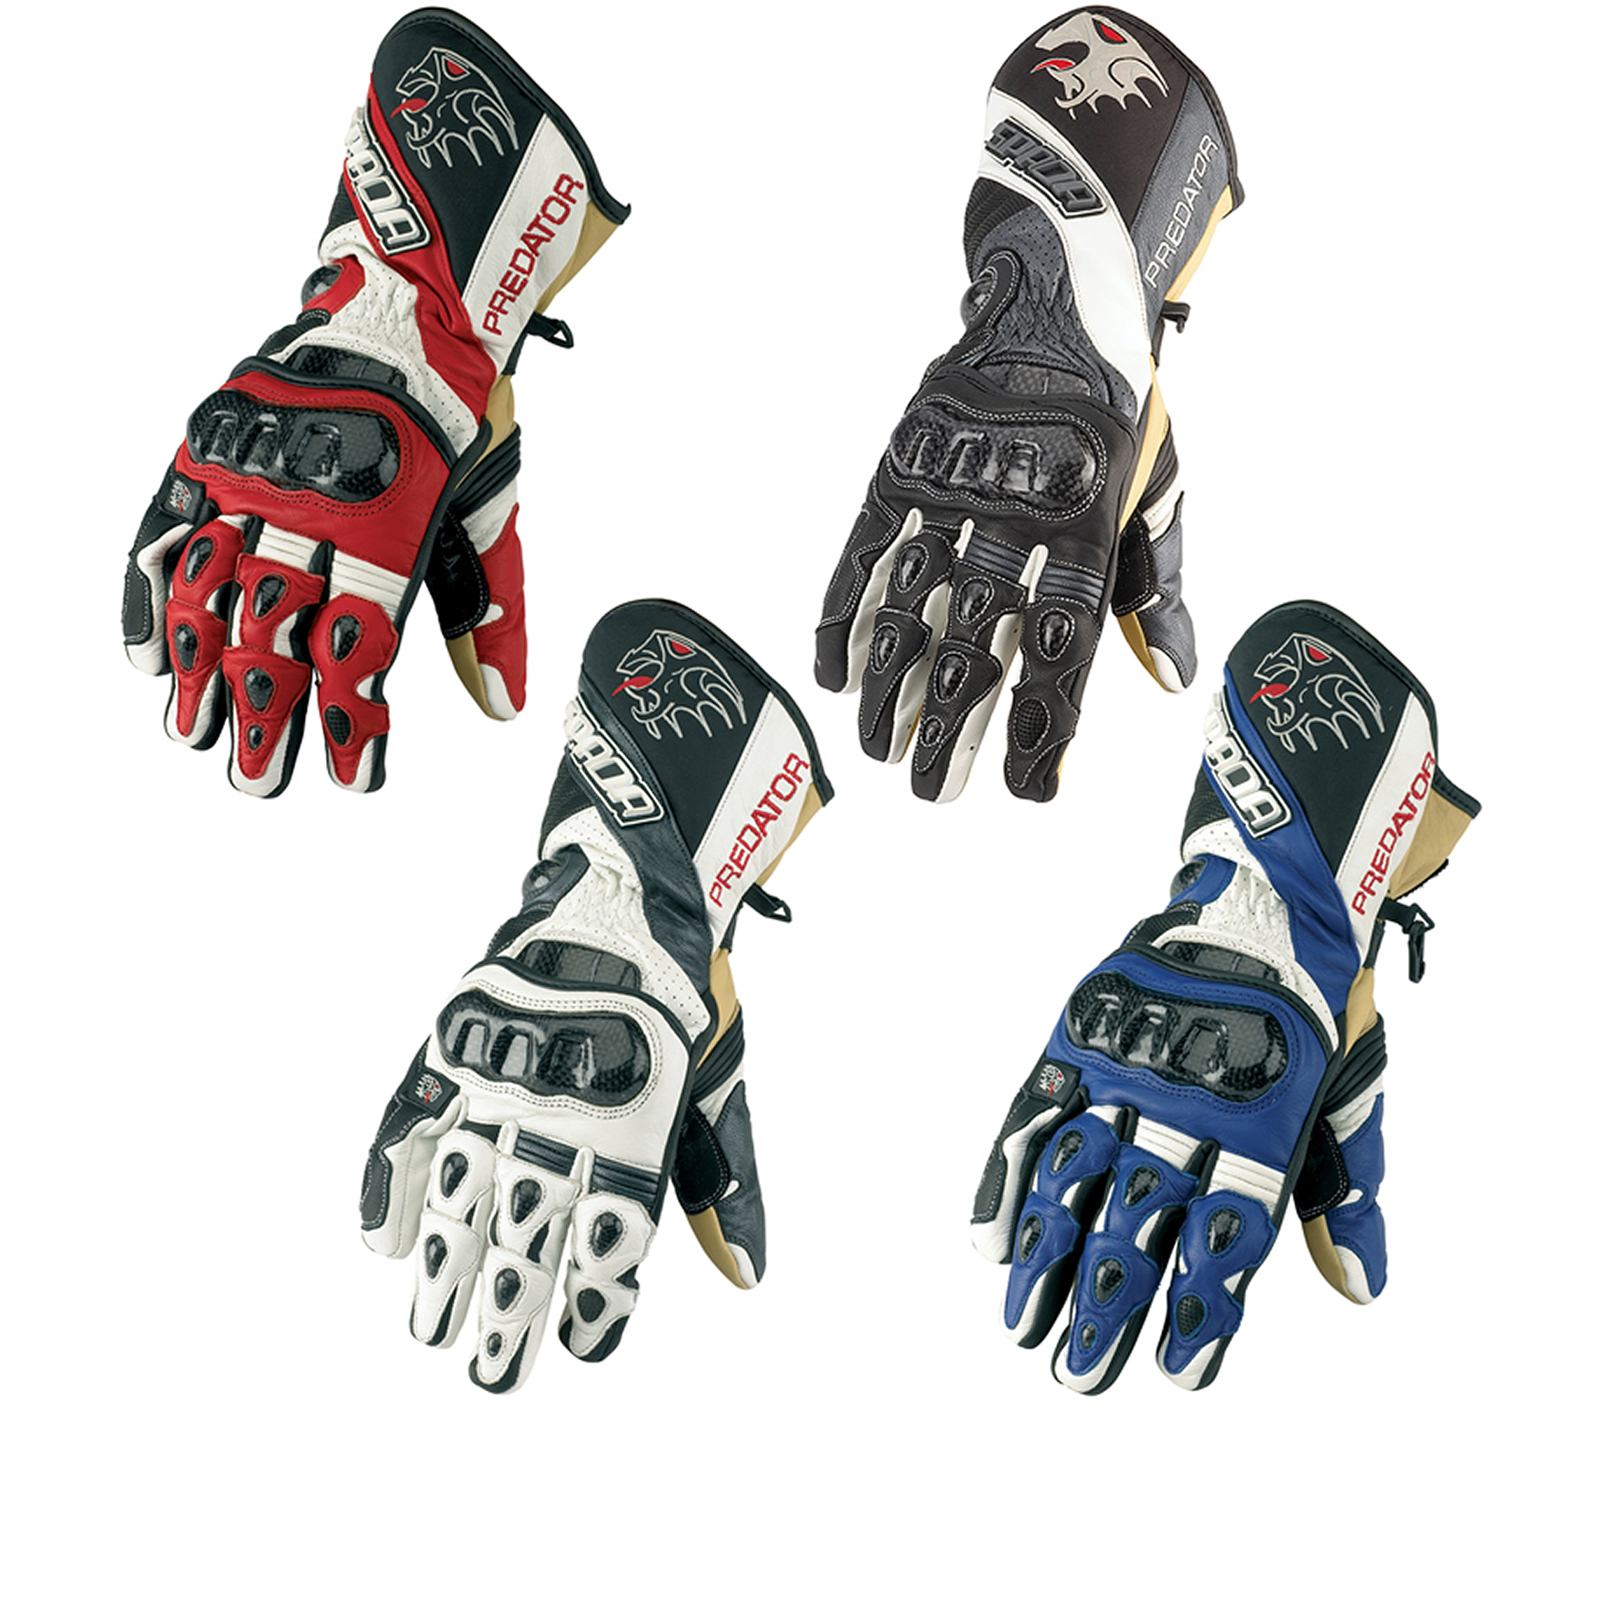 Motorcycle gloves for summer -  Gloves Summer Motorcycle Spada Predator Summer Performance Motorcycle Motorbike Race Track